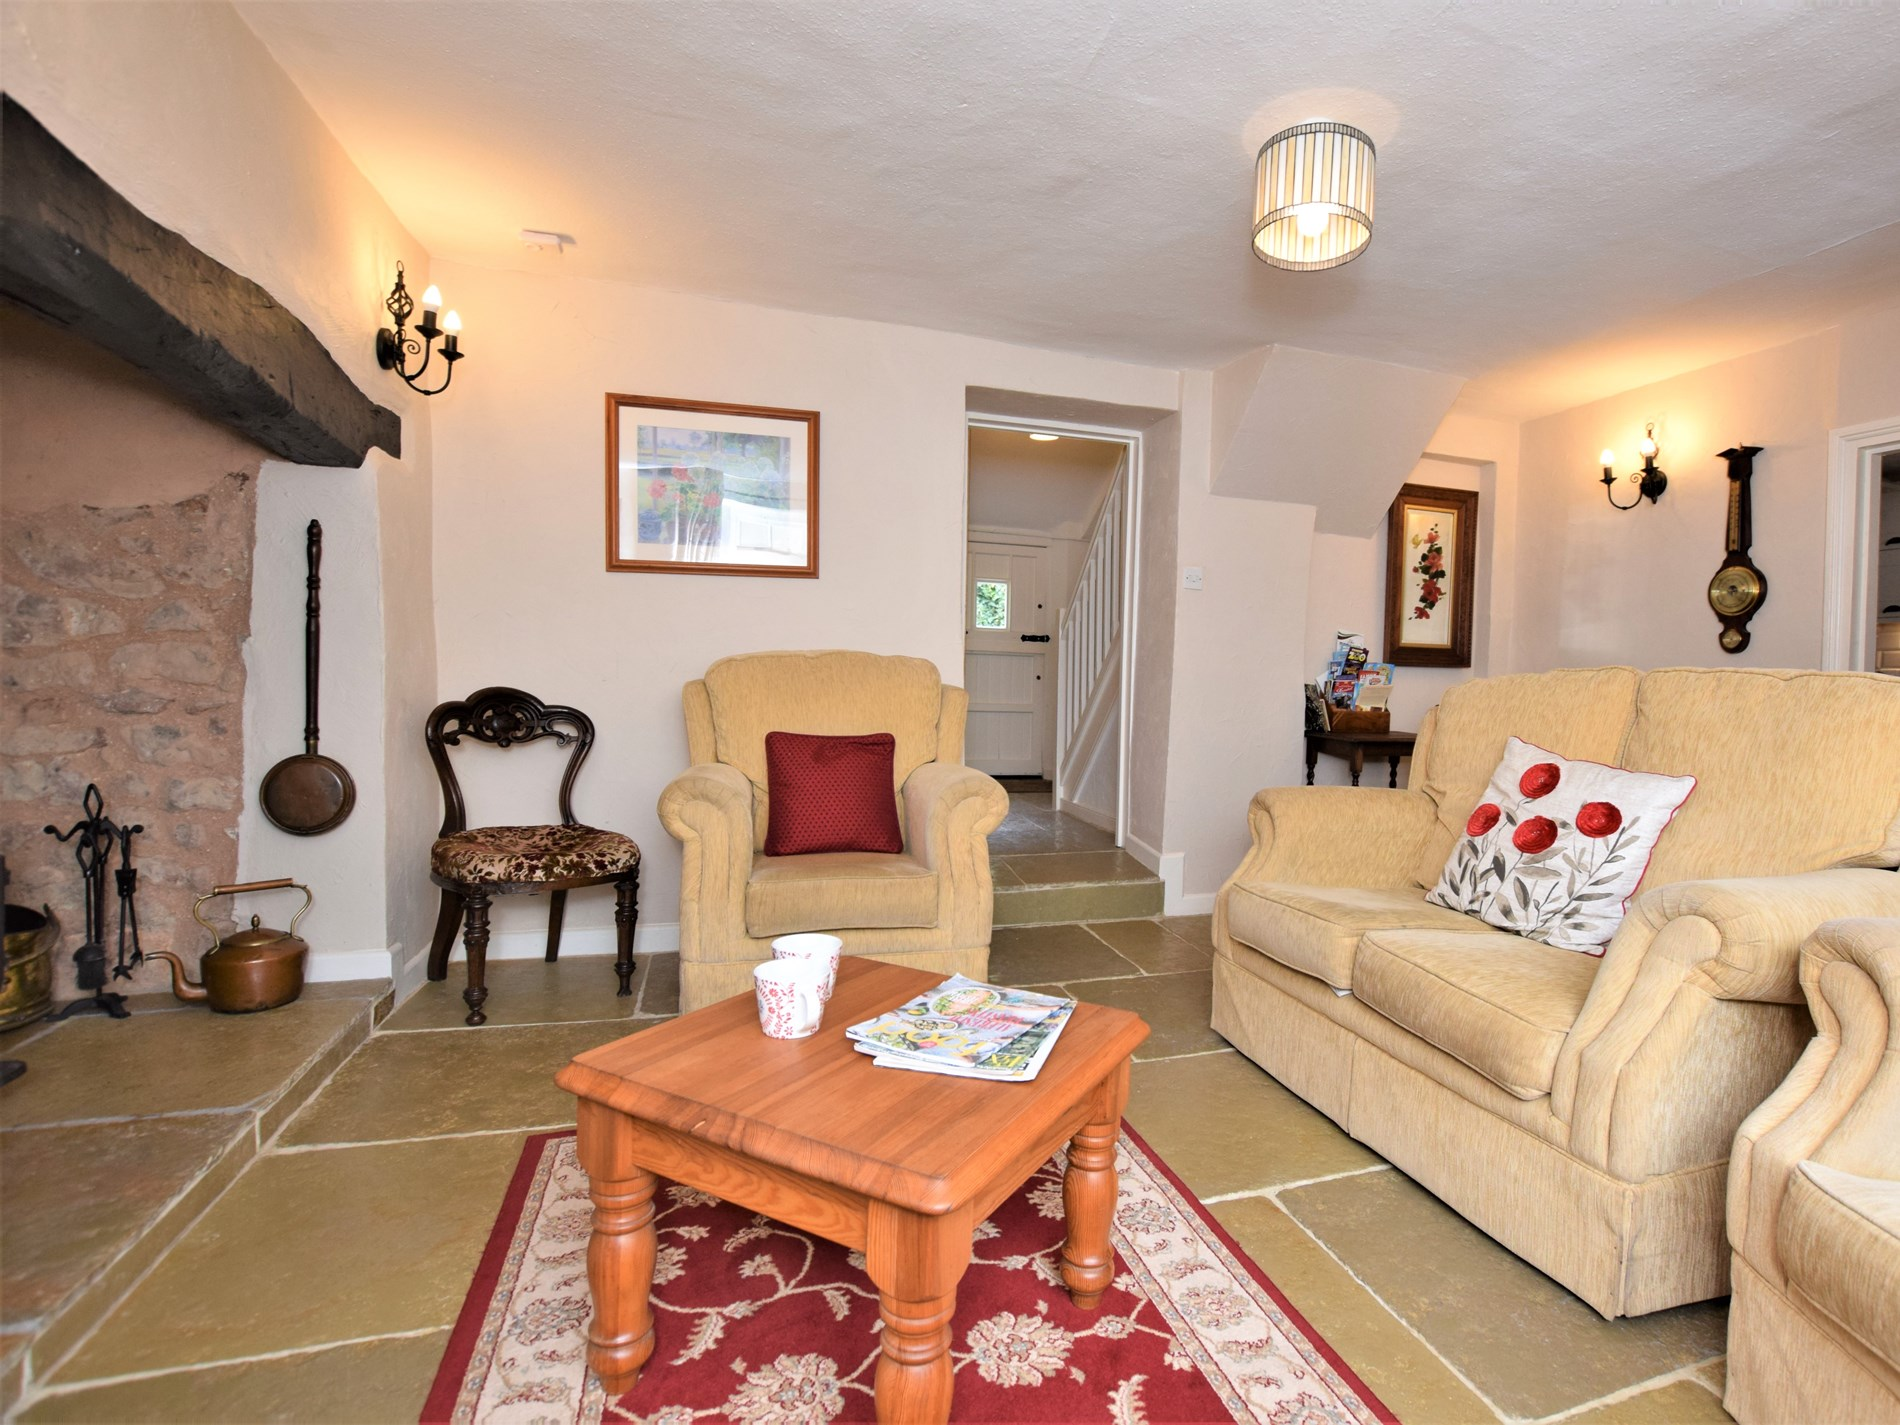 2 Bedroom Cottage in Somerset, Dorset and Somerset